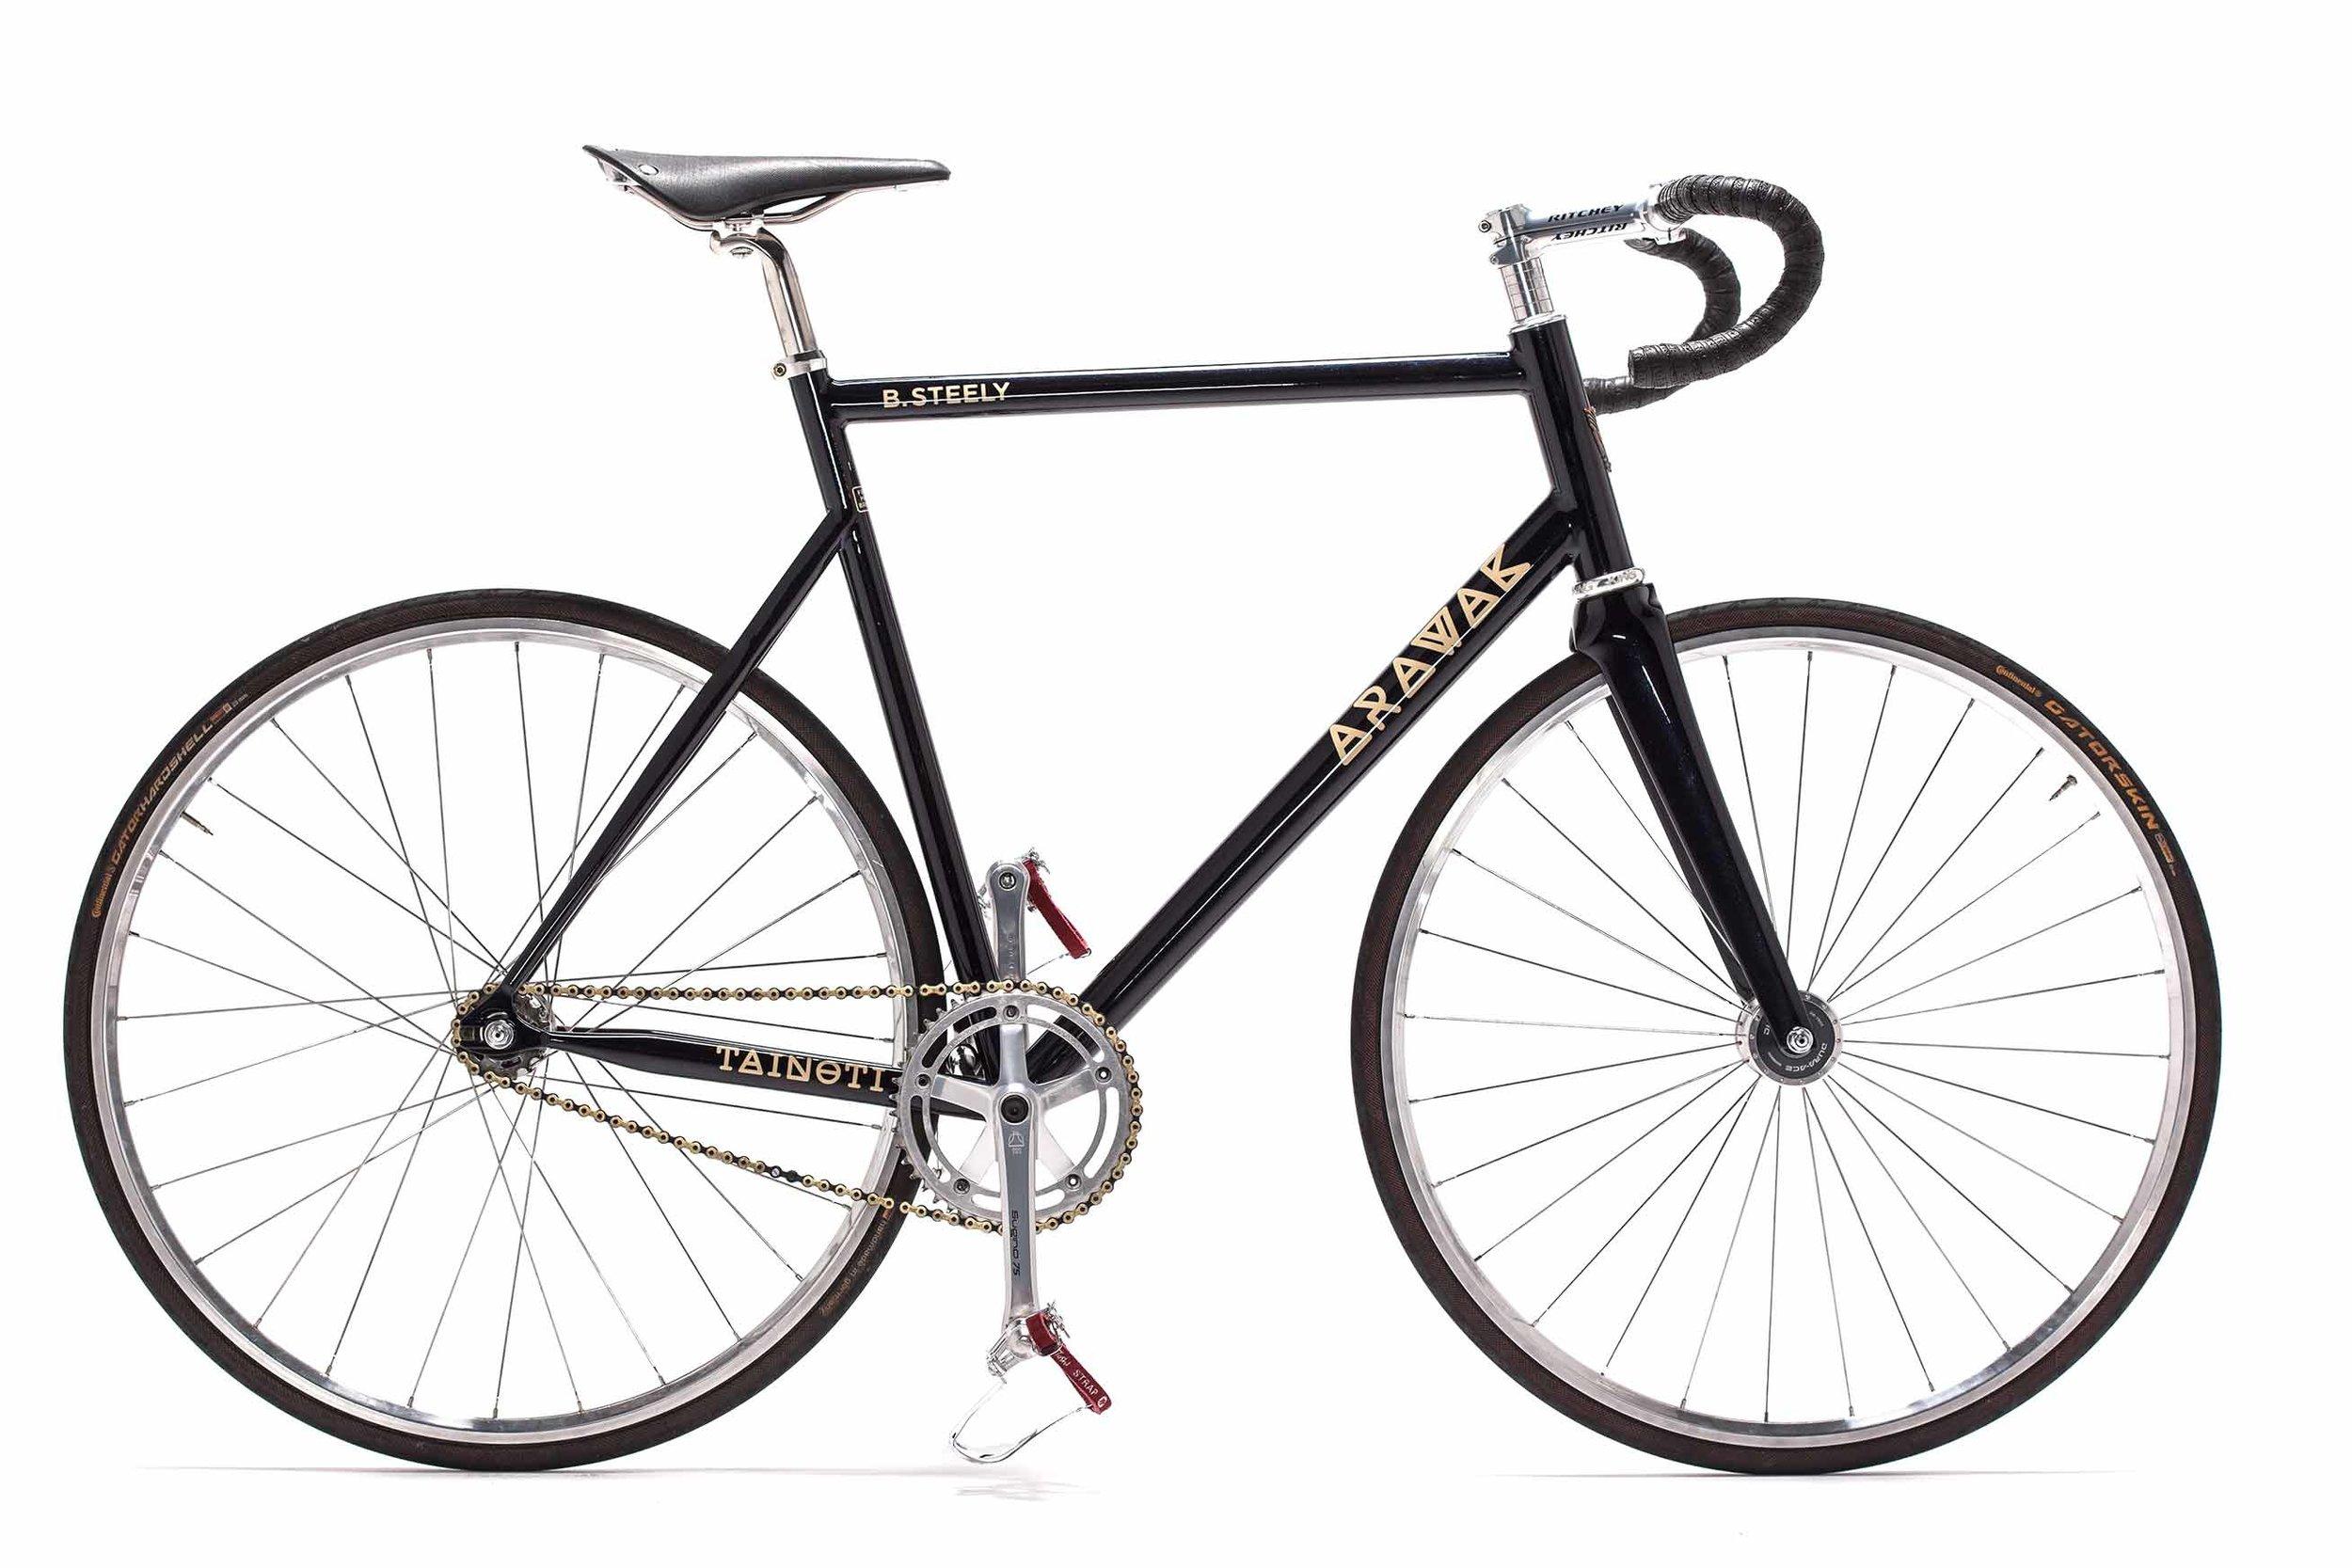 Arawak Cycles Steely Bike